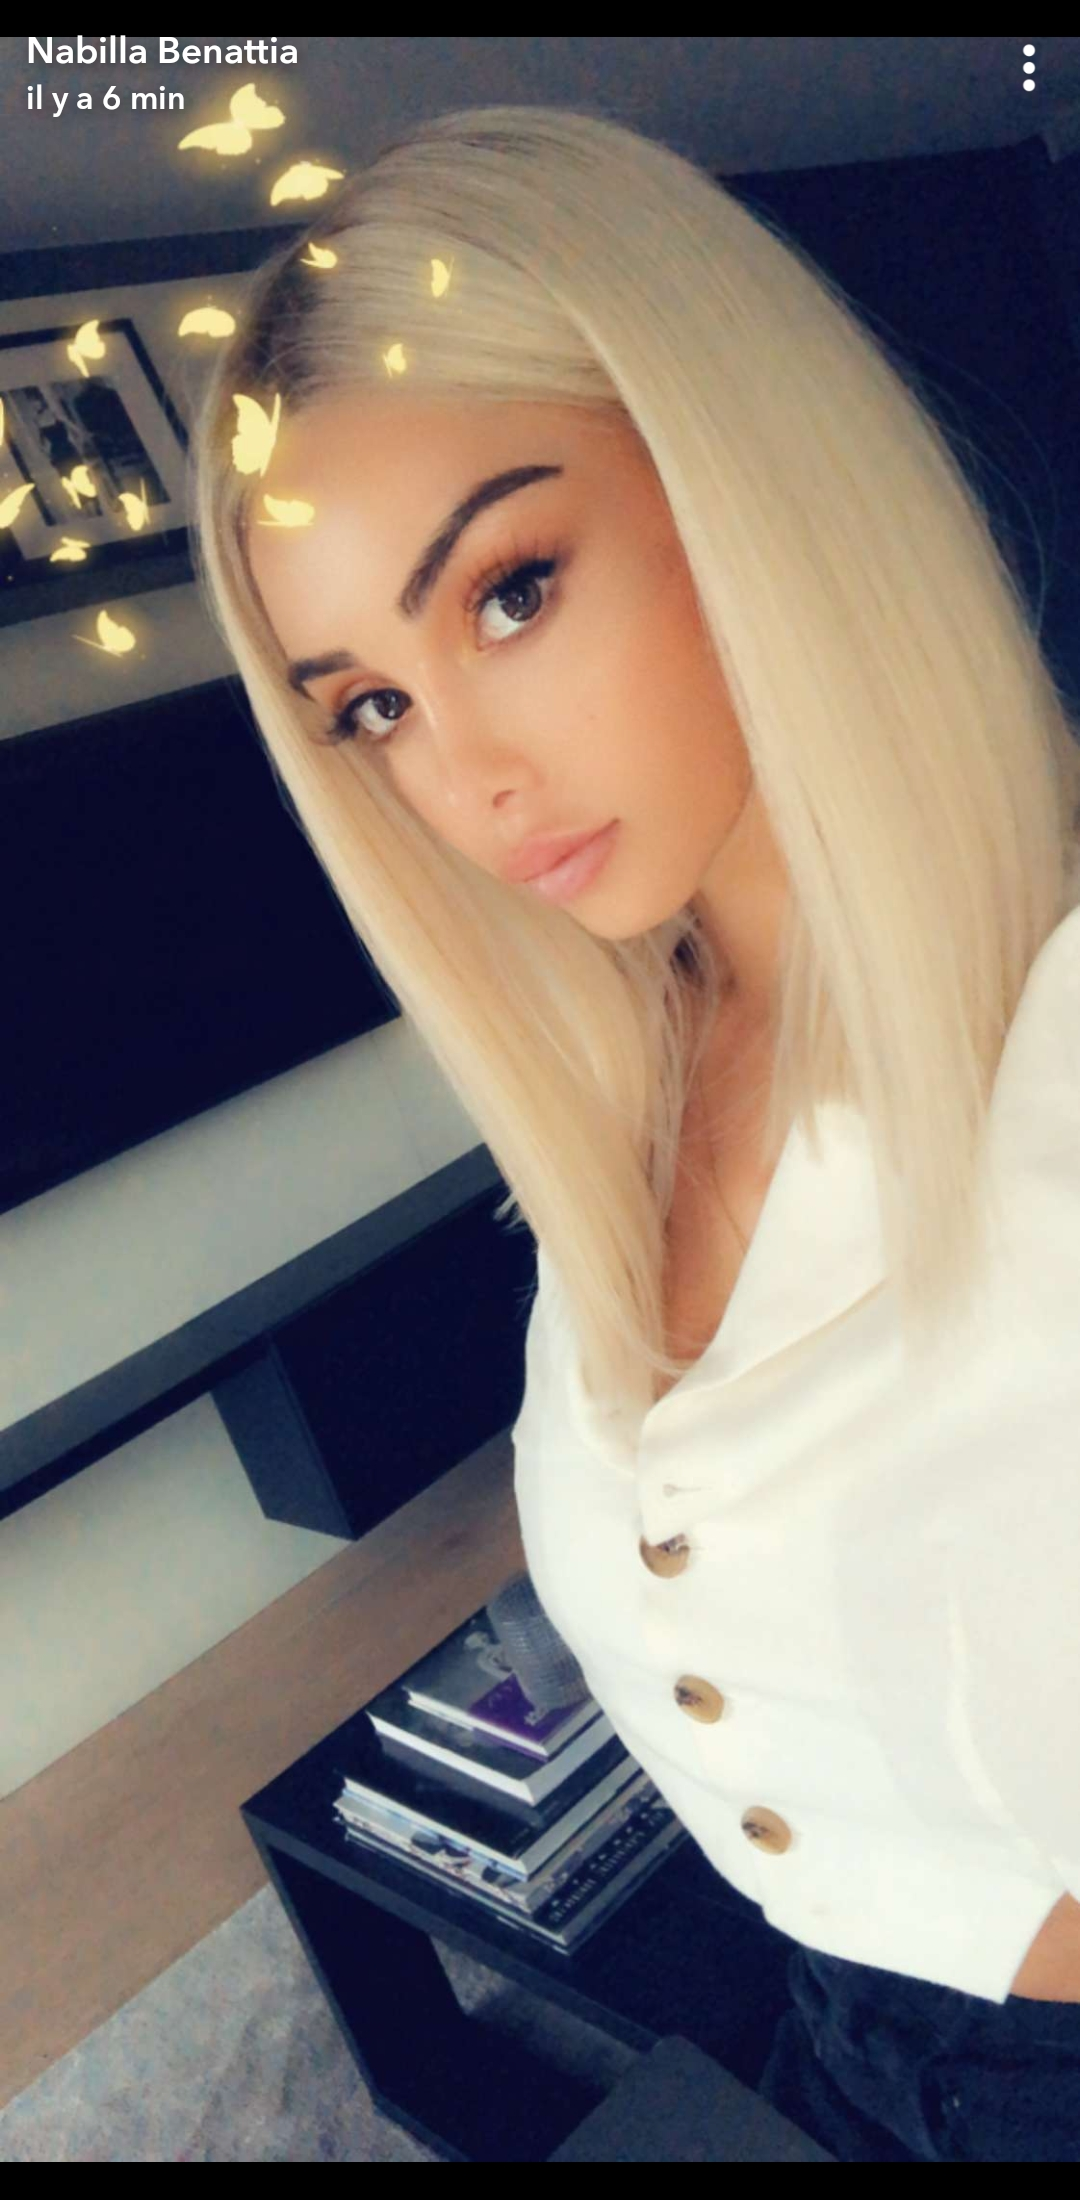 Nabilla Benattia métamorphosée : Elle s'essaie au blond platine !